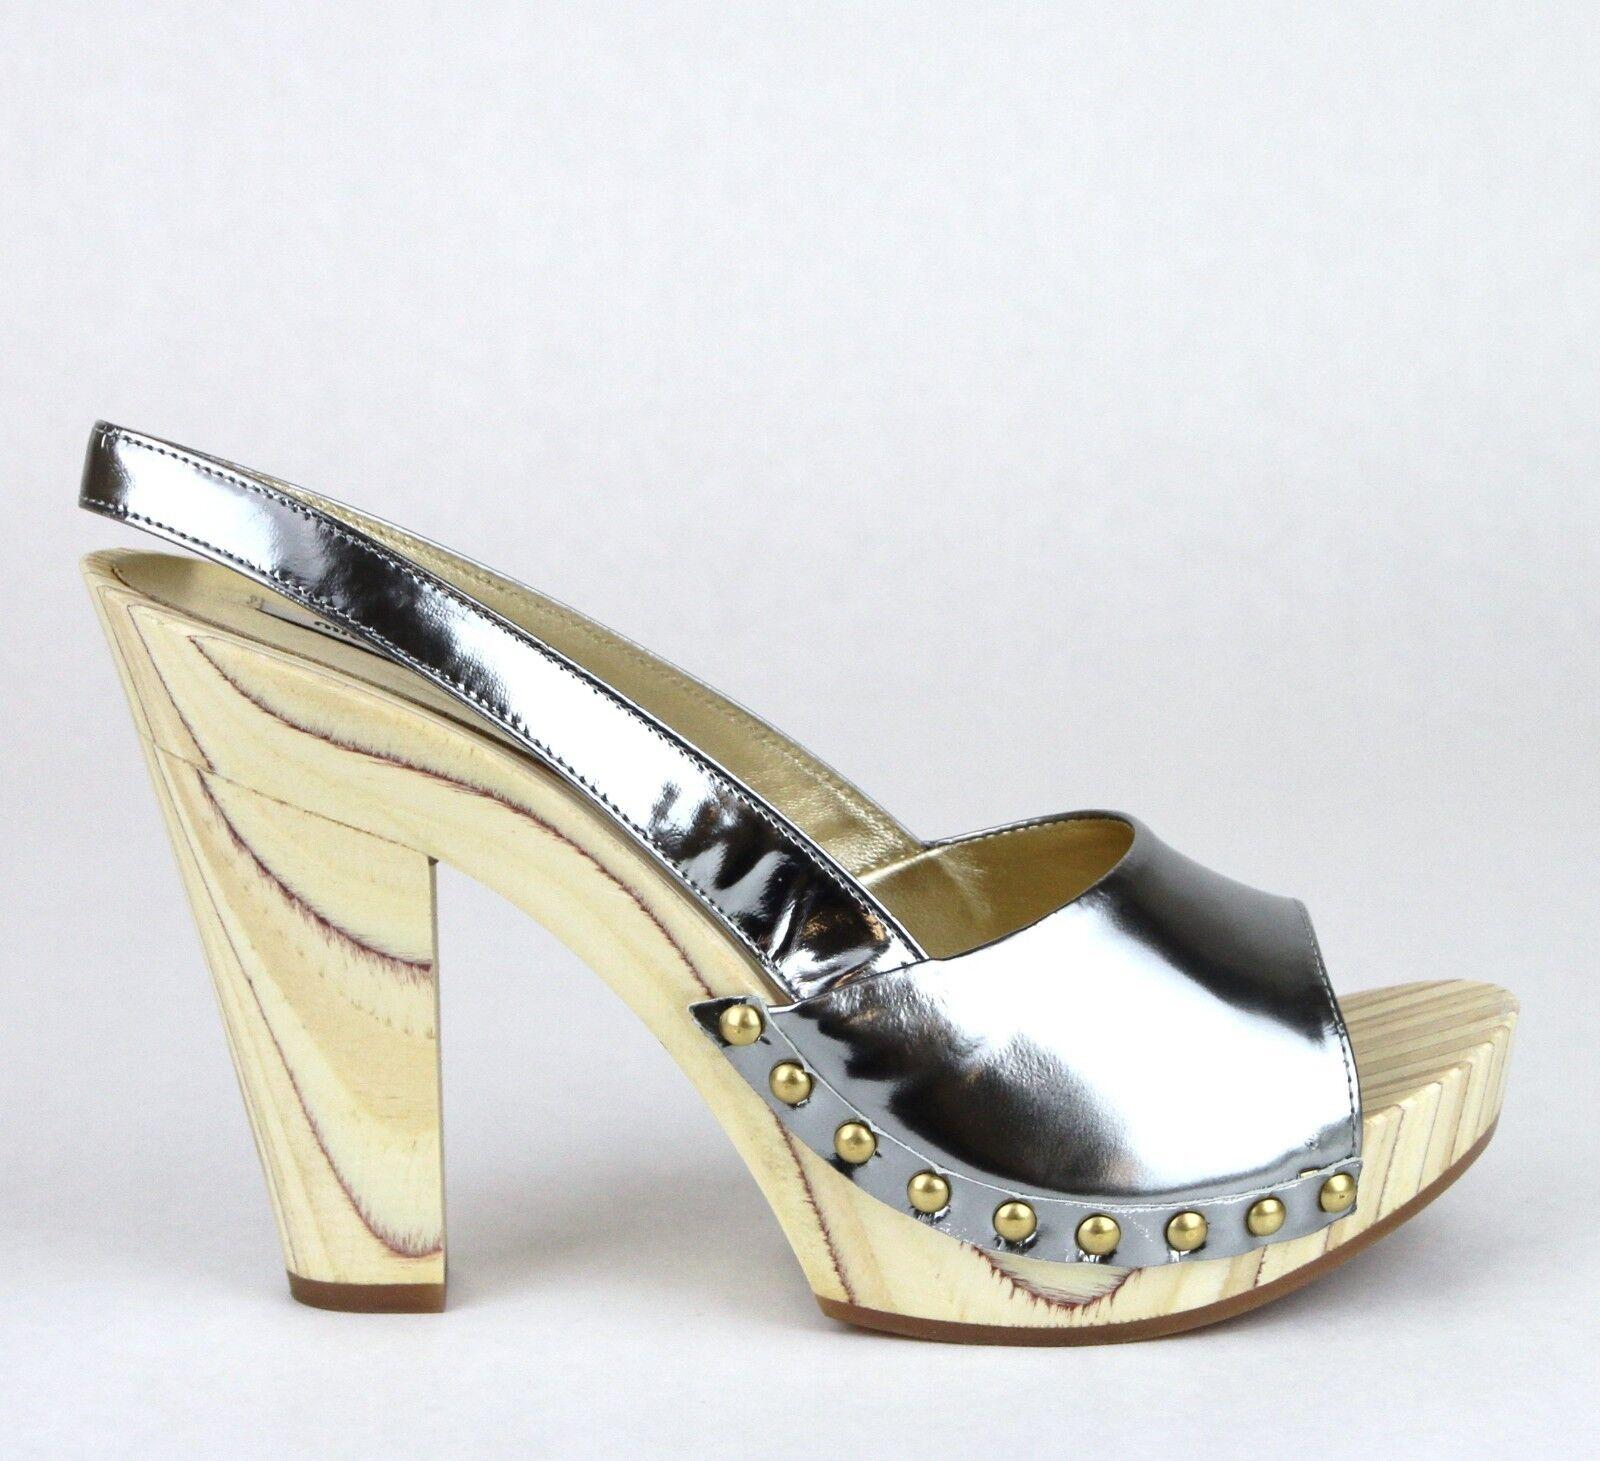 450 New Authentic MIU MIU Leather Platform Clog Studded Sandal Silver 5Z4723